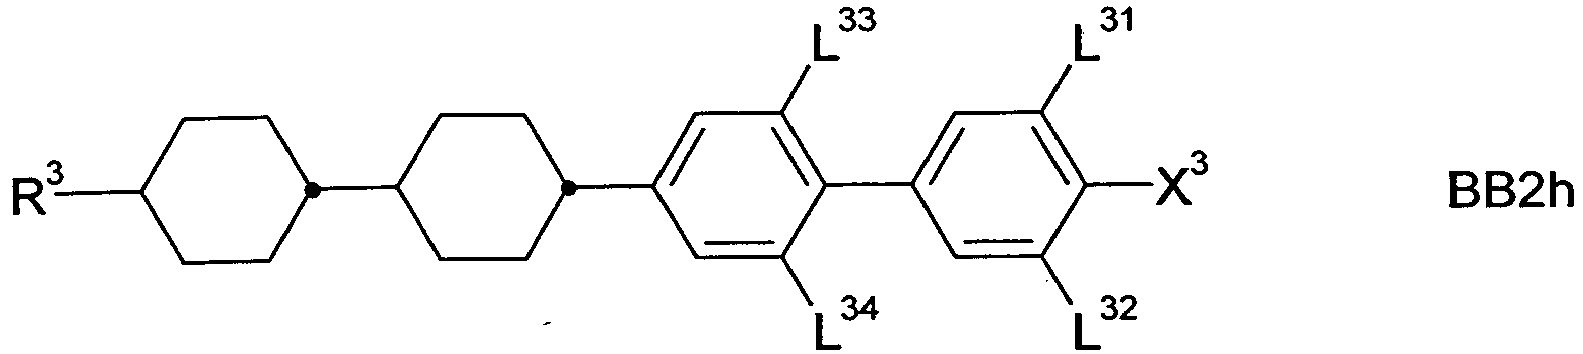 Figure imgb0538